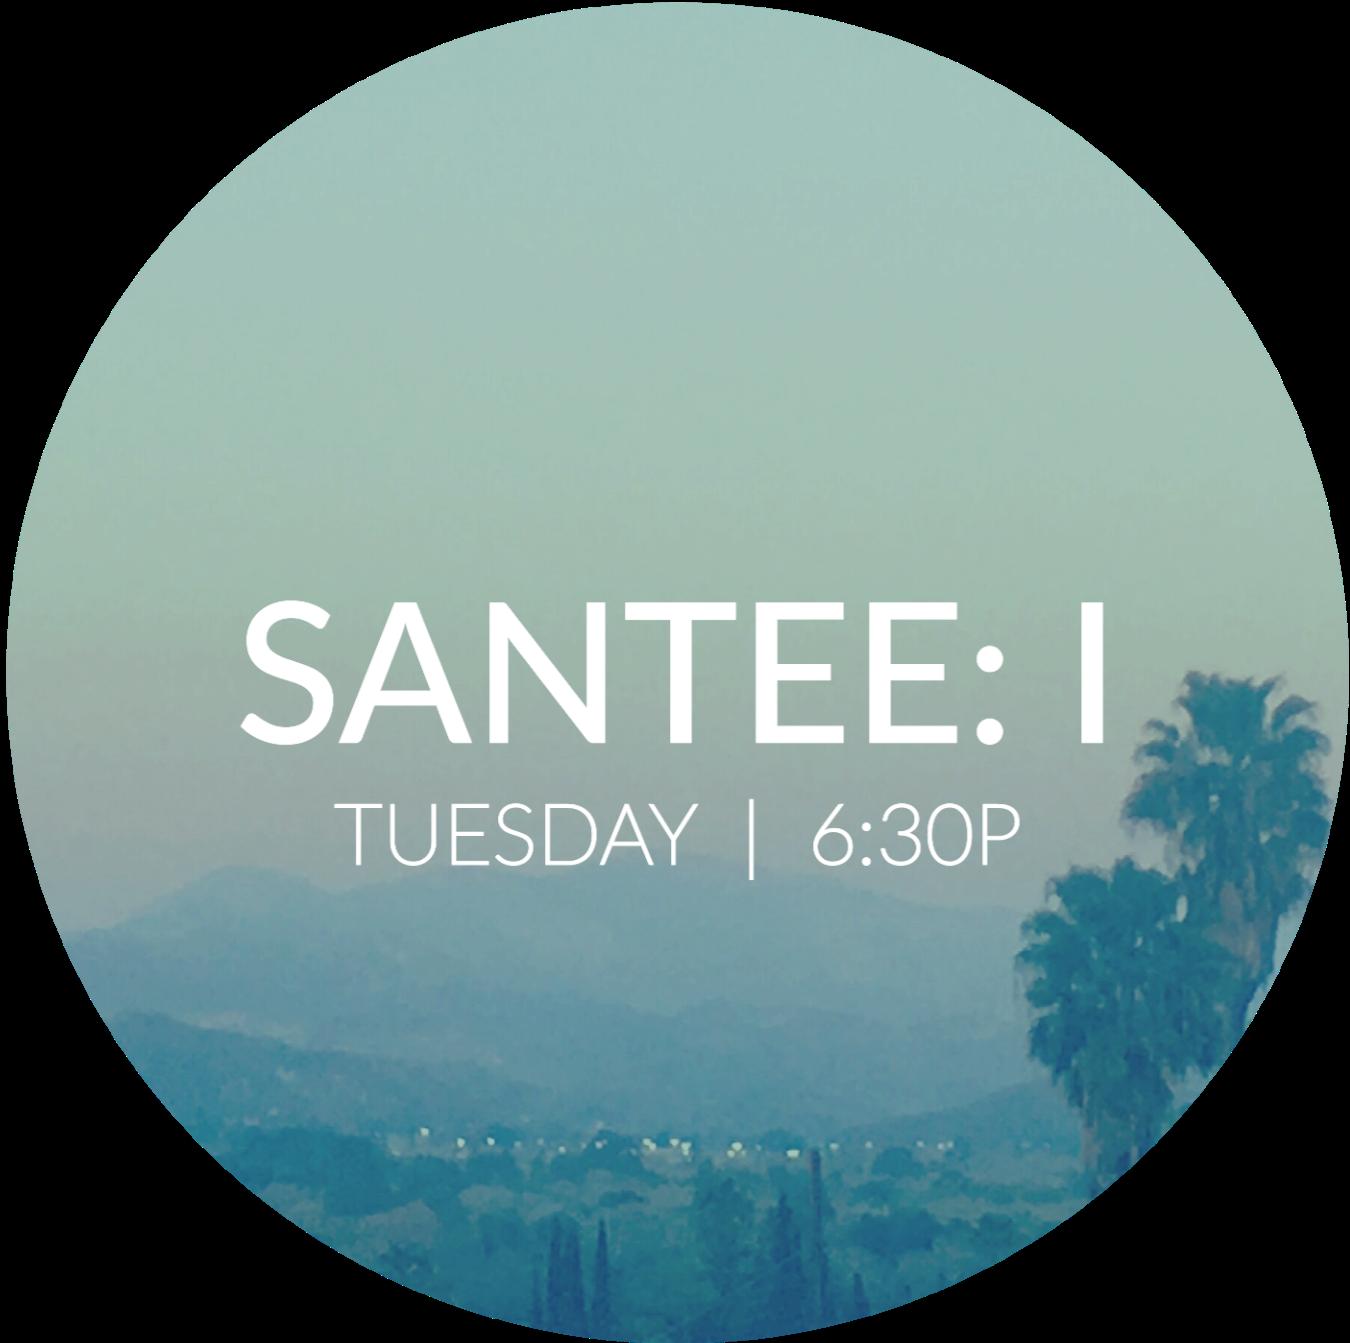 Santee: I